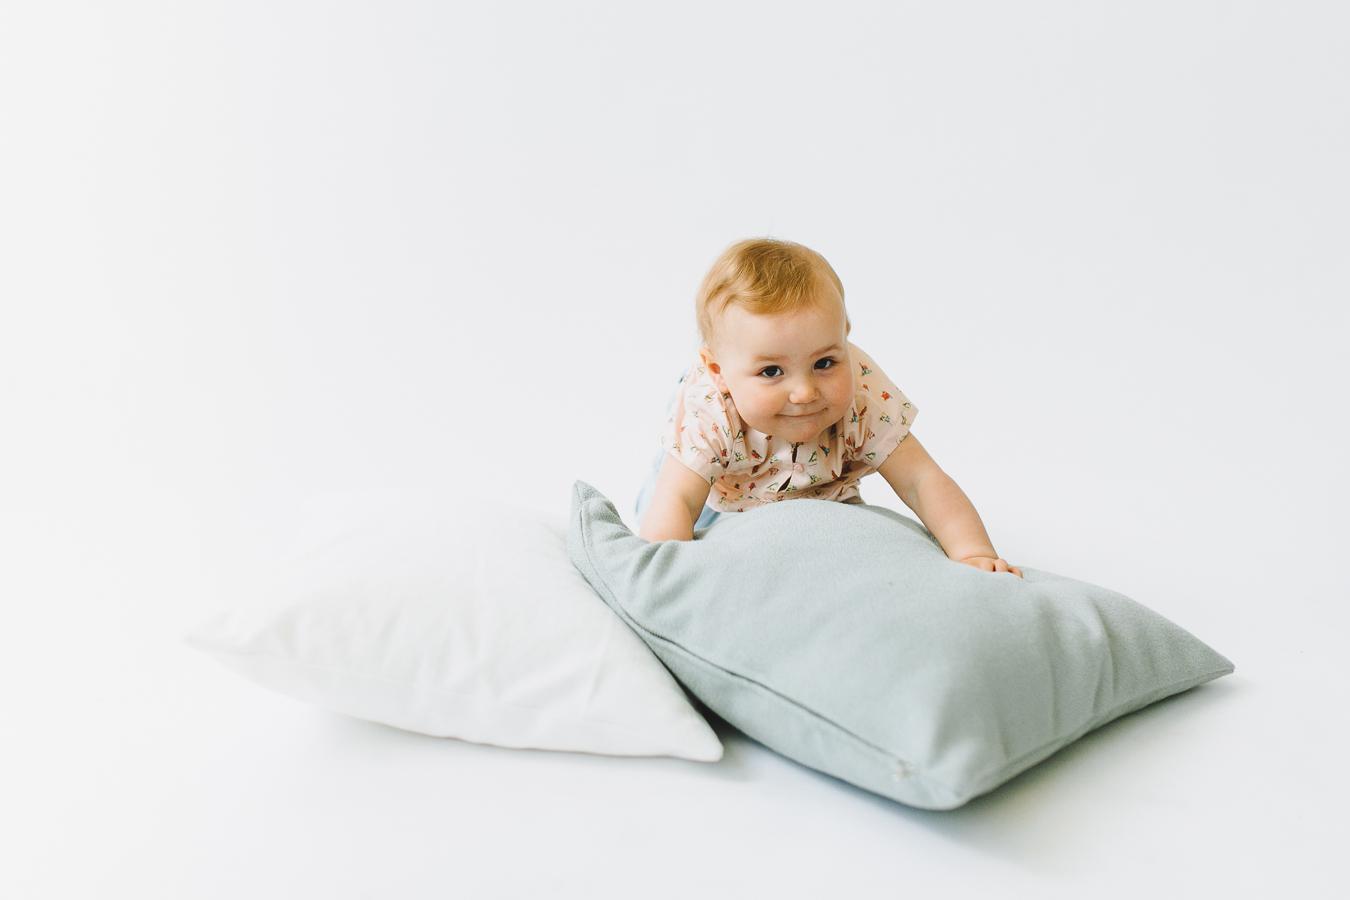 Baby-Lifestyle-Photographer-Portrait-14.jpg